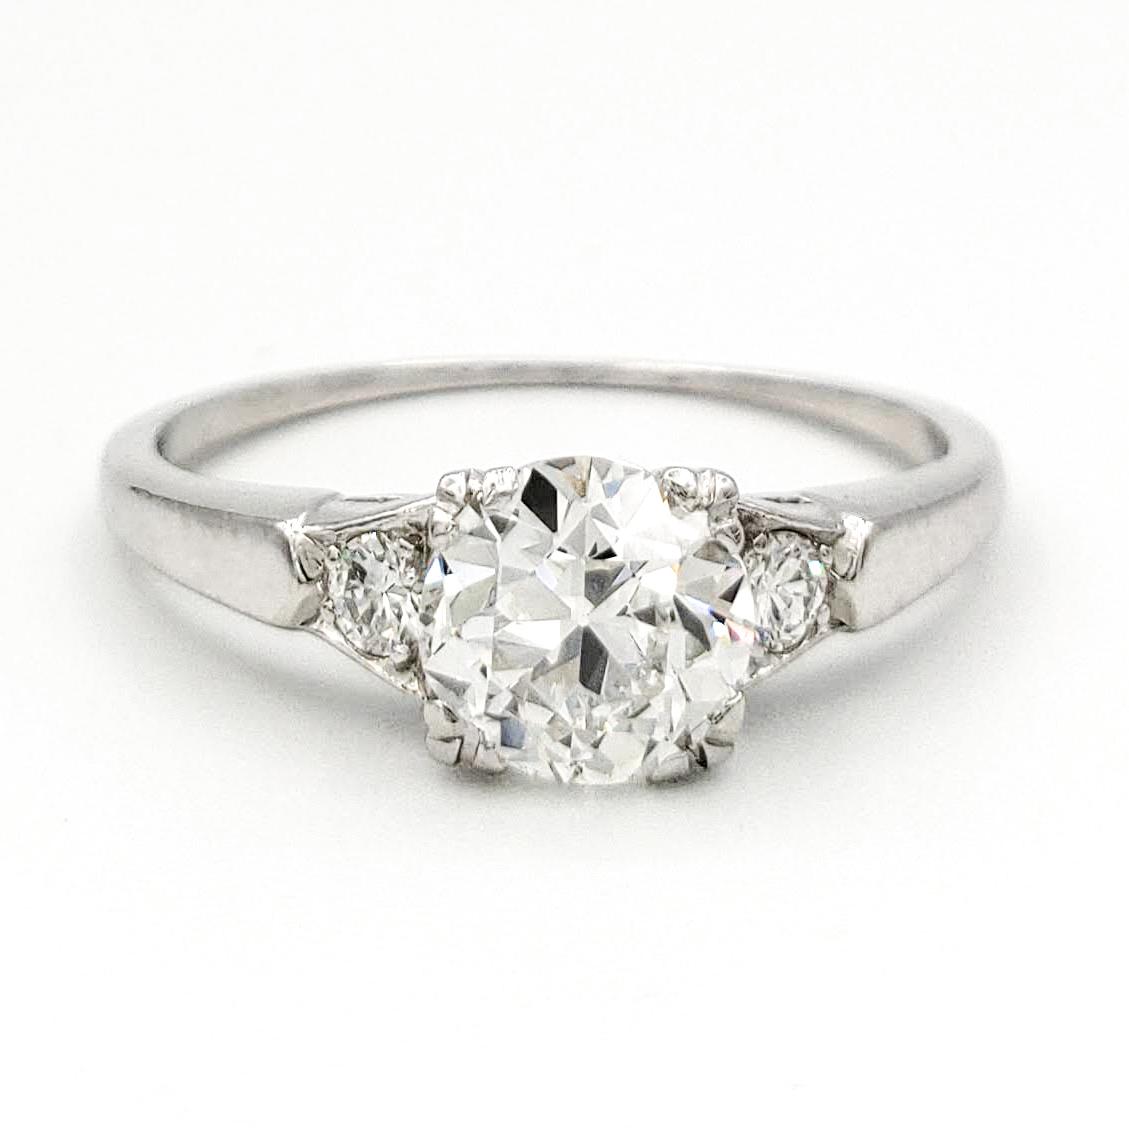 vintage-platinum-engagement-ring-with-0-74-carat-old-european-cut-diamond-egl-g-vs1